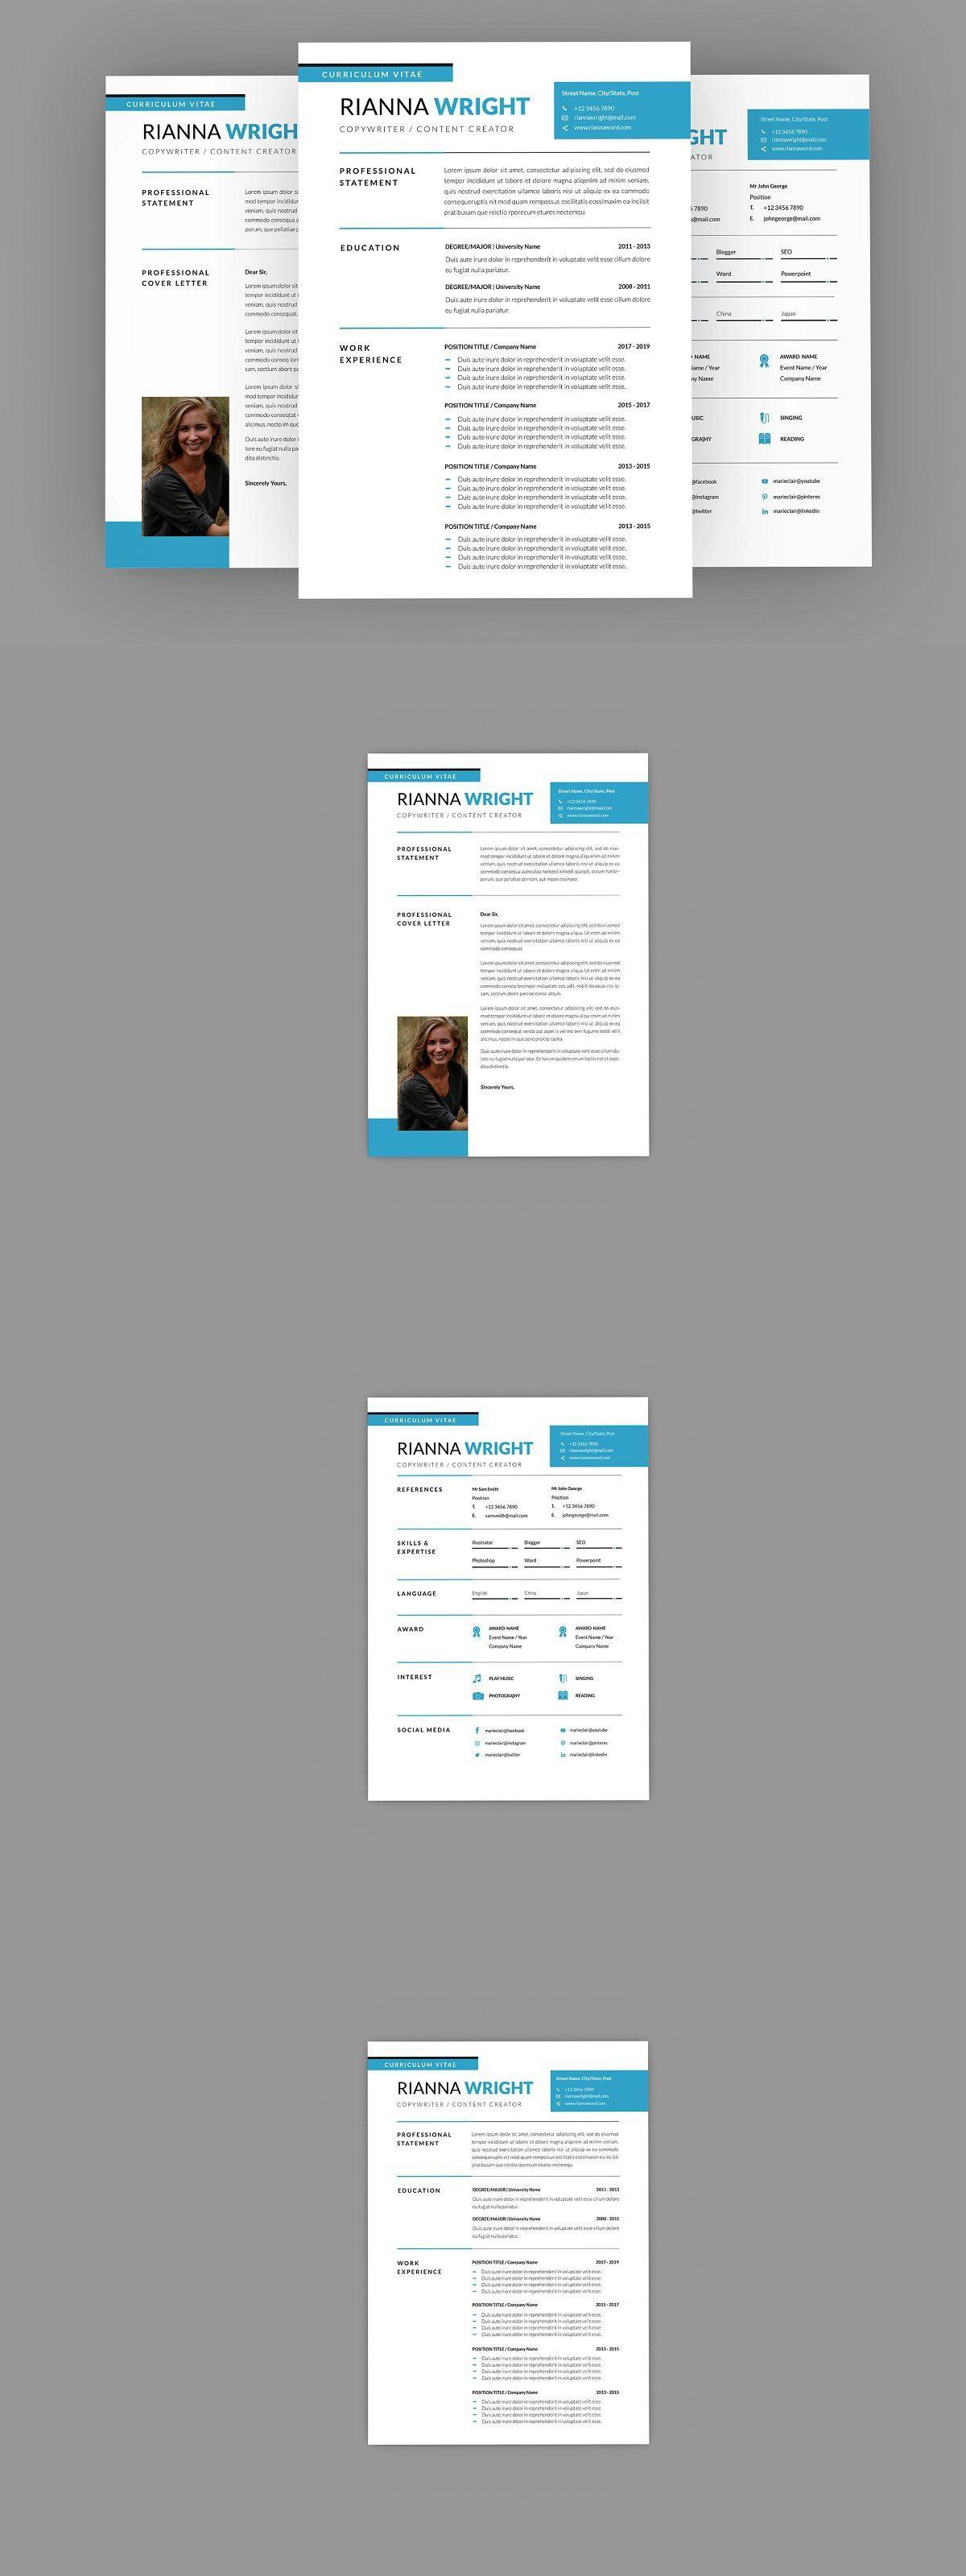 Riannna CopyWriter Resume Designer in 2020 Resume